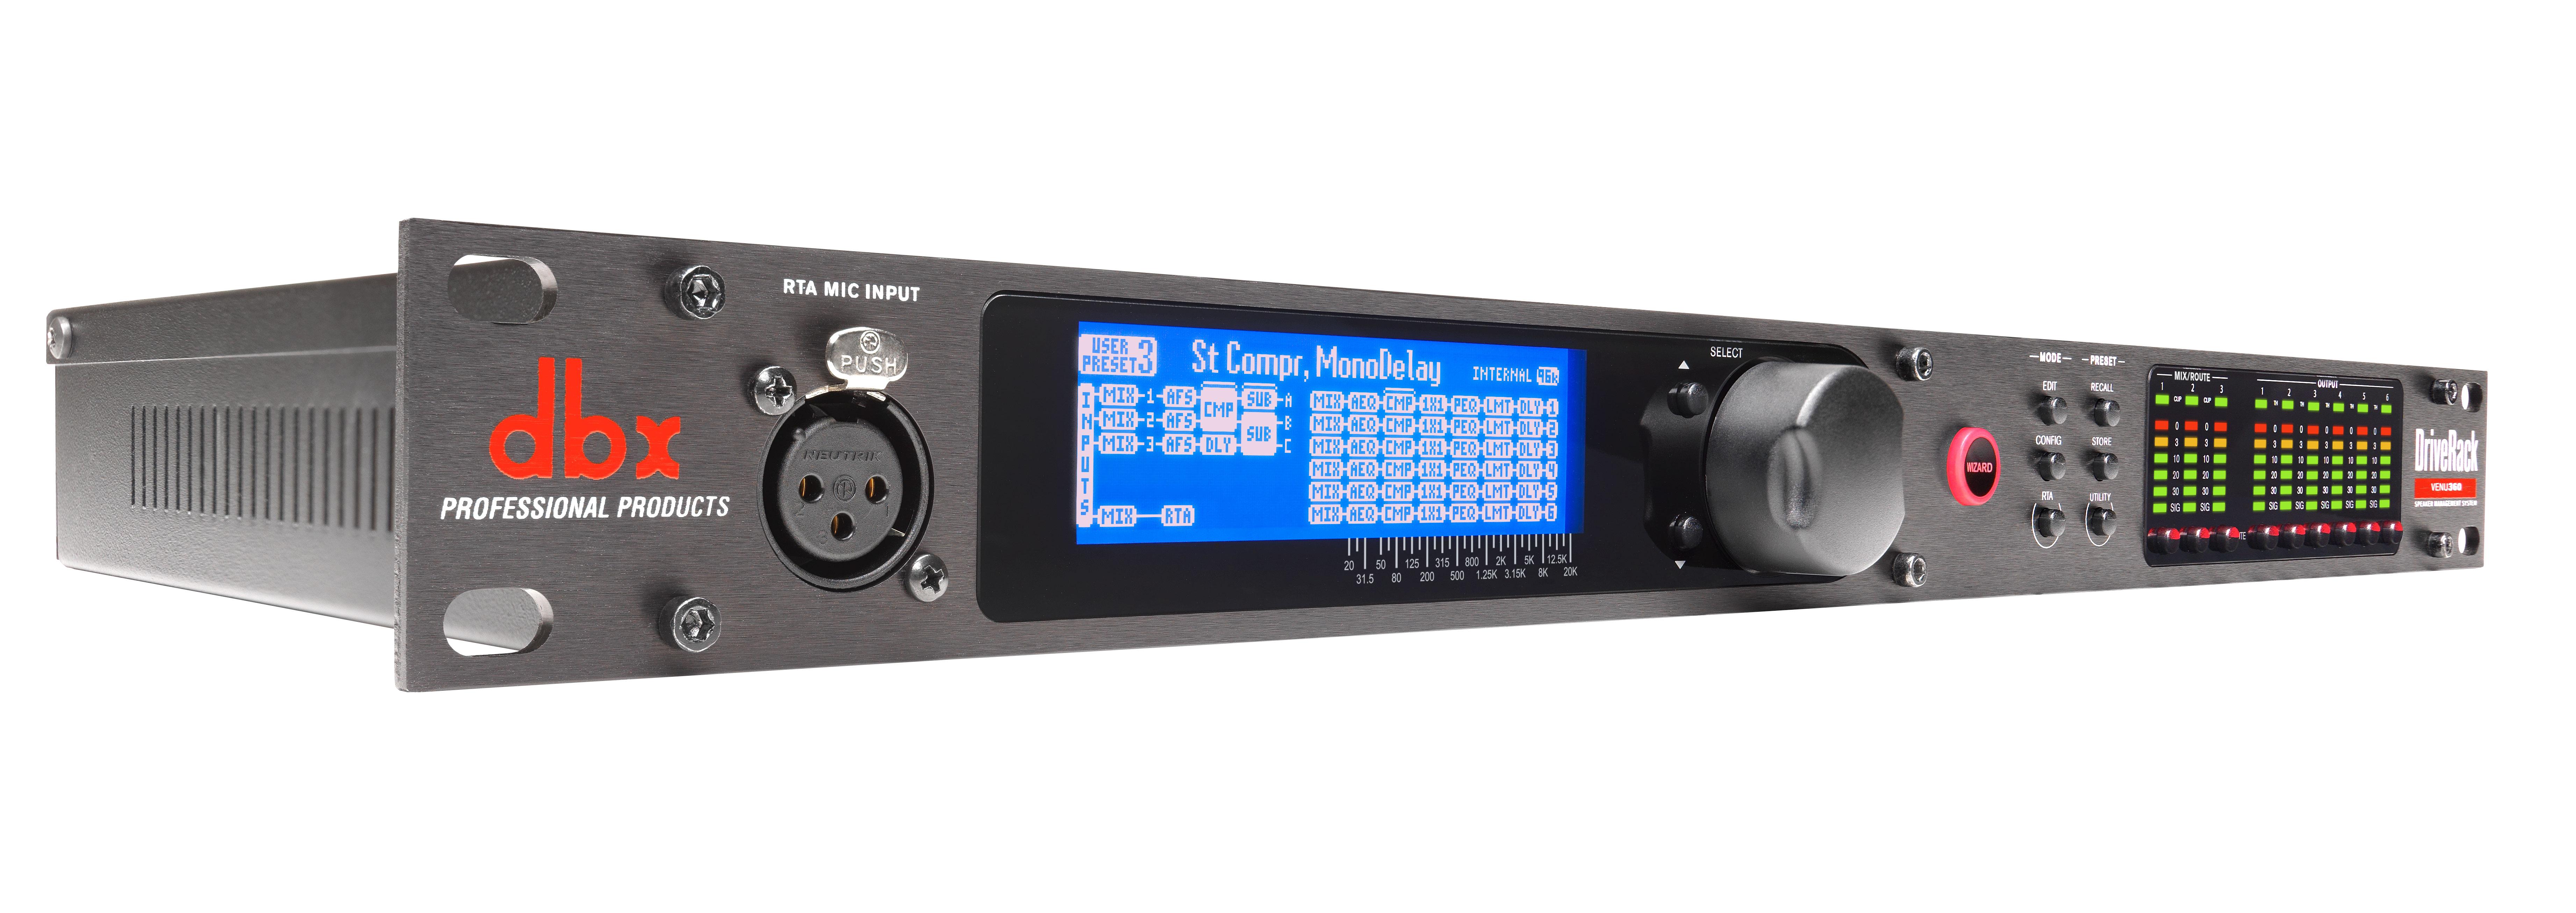 Driverack Venu360 Dbx Professional Audio